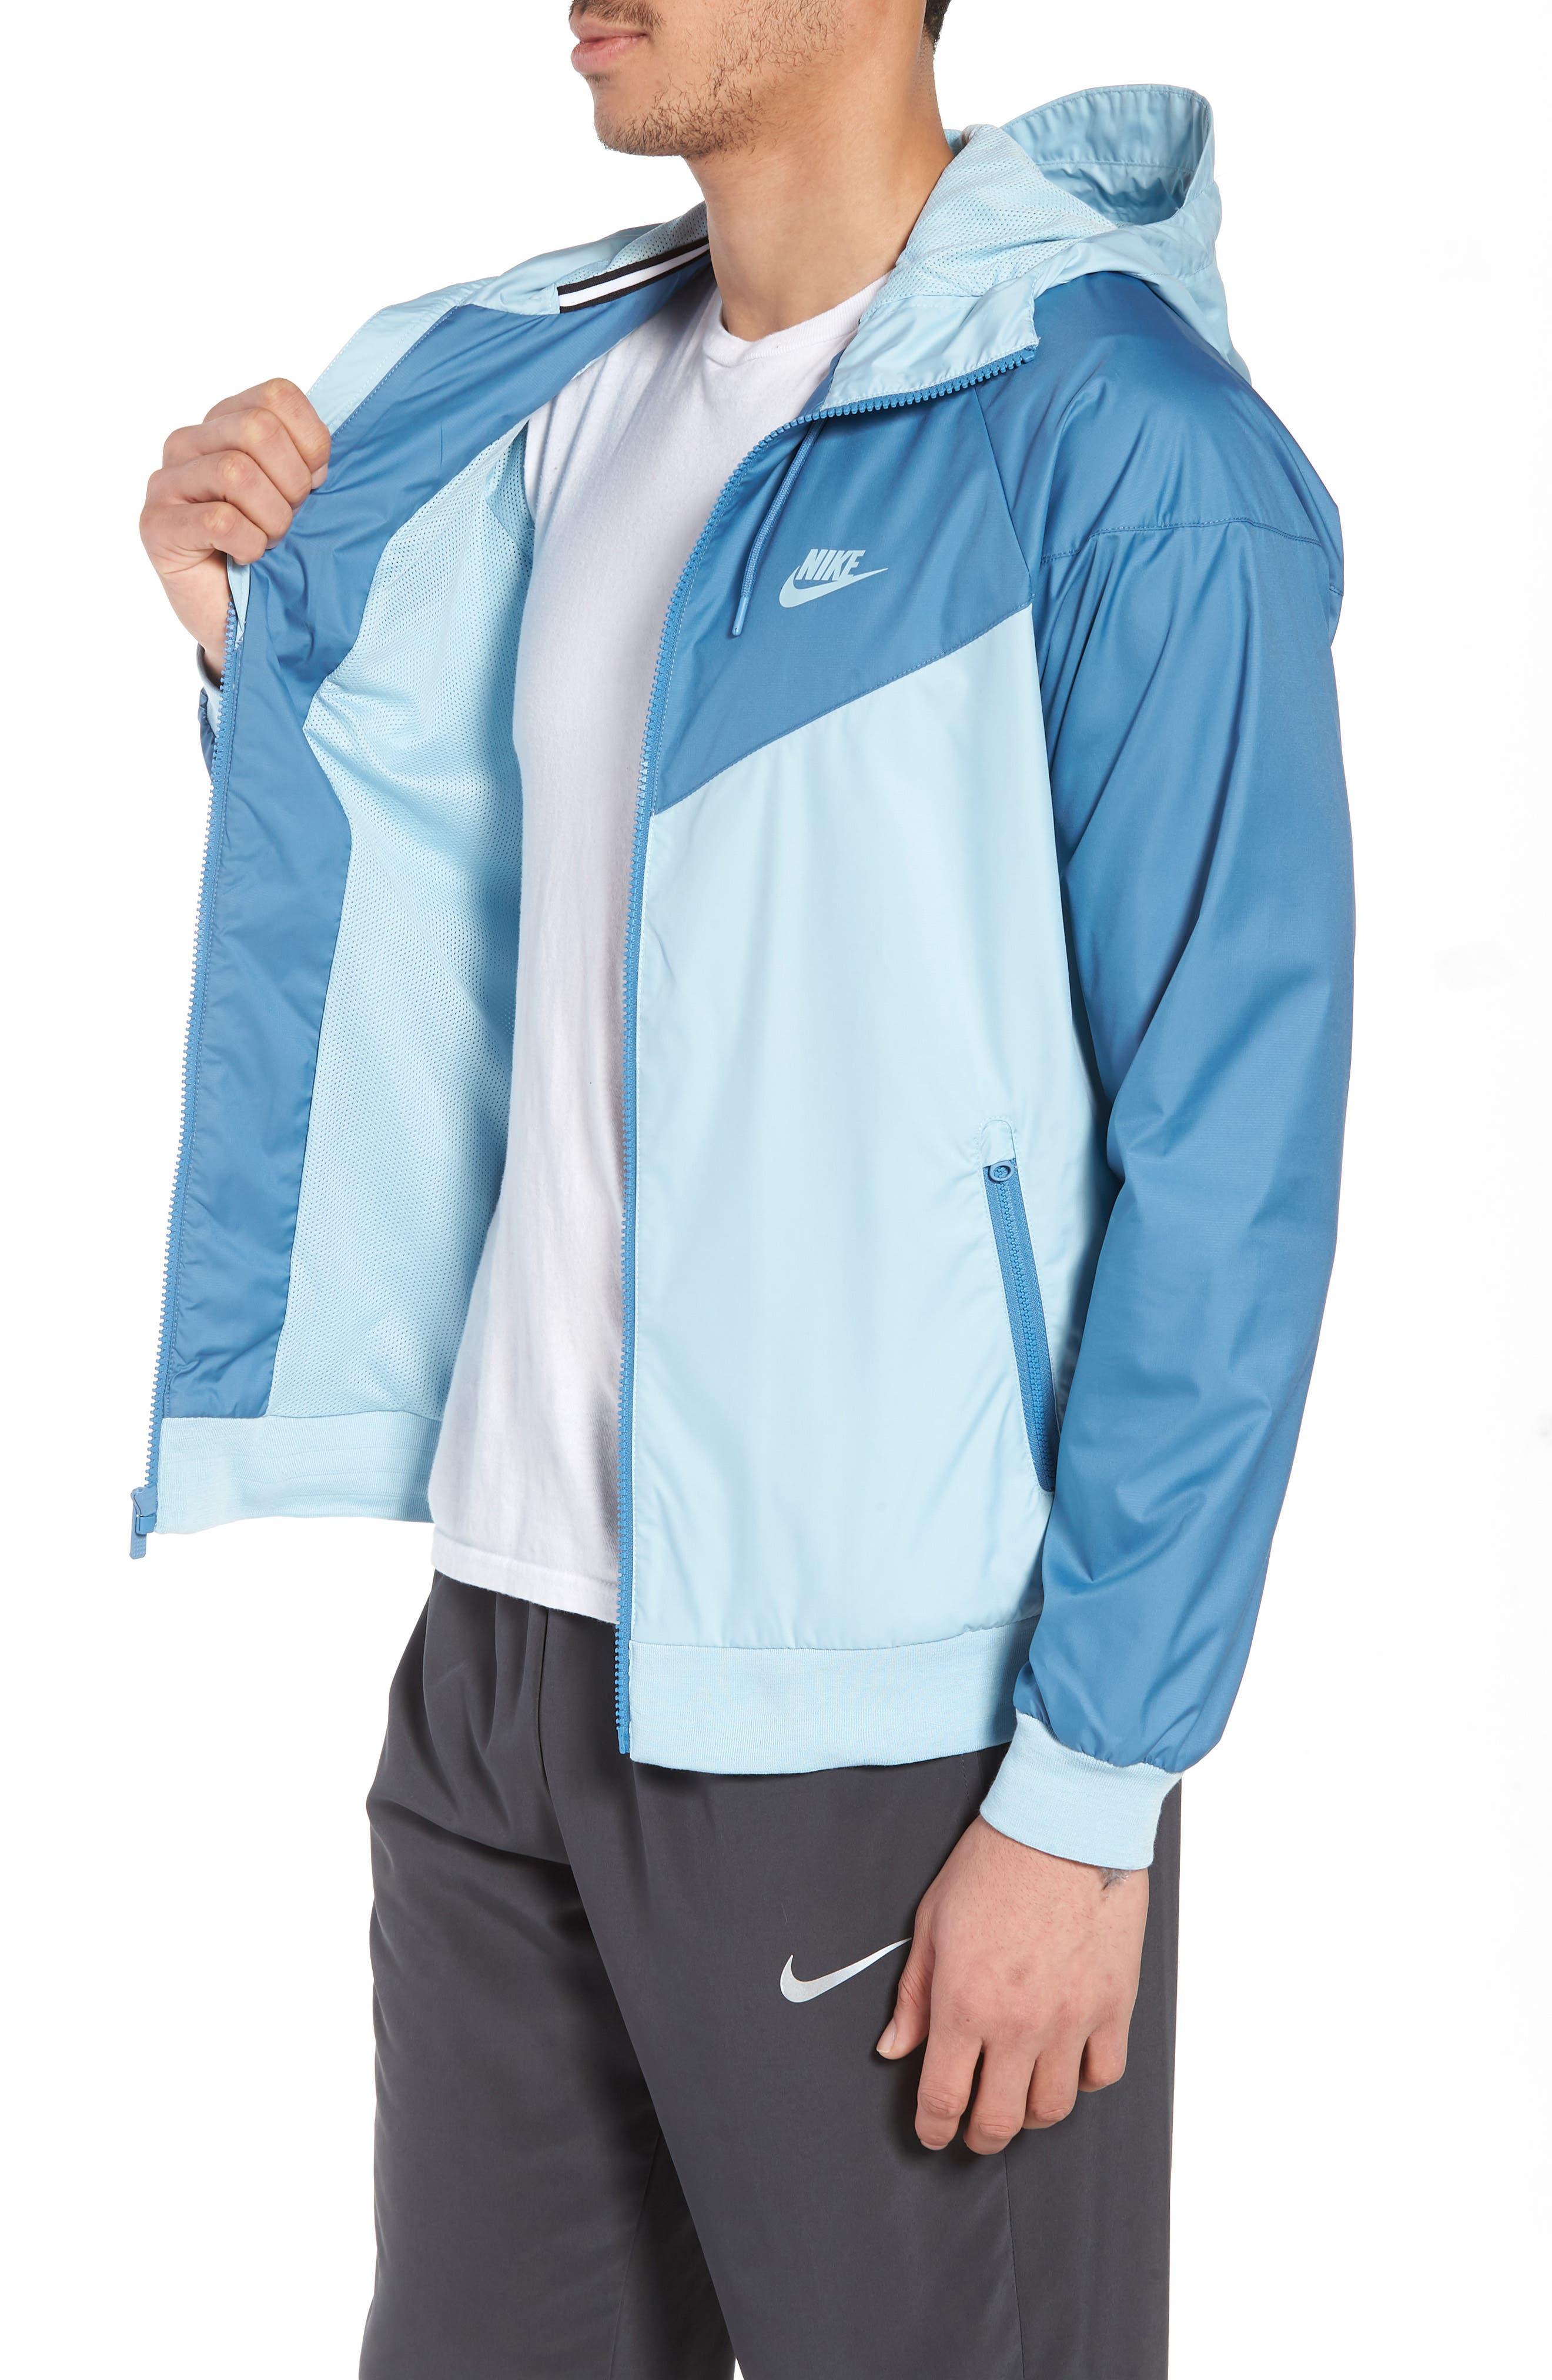 NIKE, Windrunner Colorblock Jacket, Alternate thumbnail 4, color, OCEAN BLISS/ AEGEAN STORM